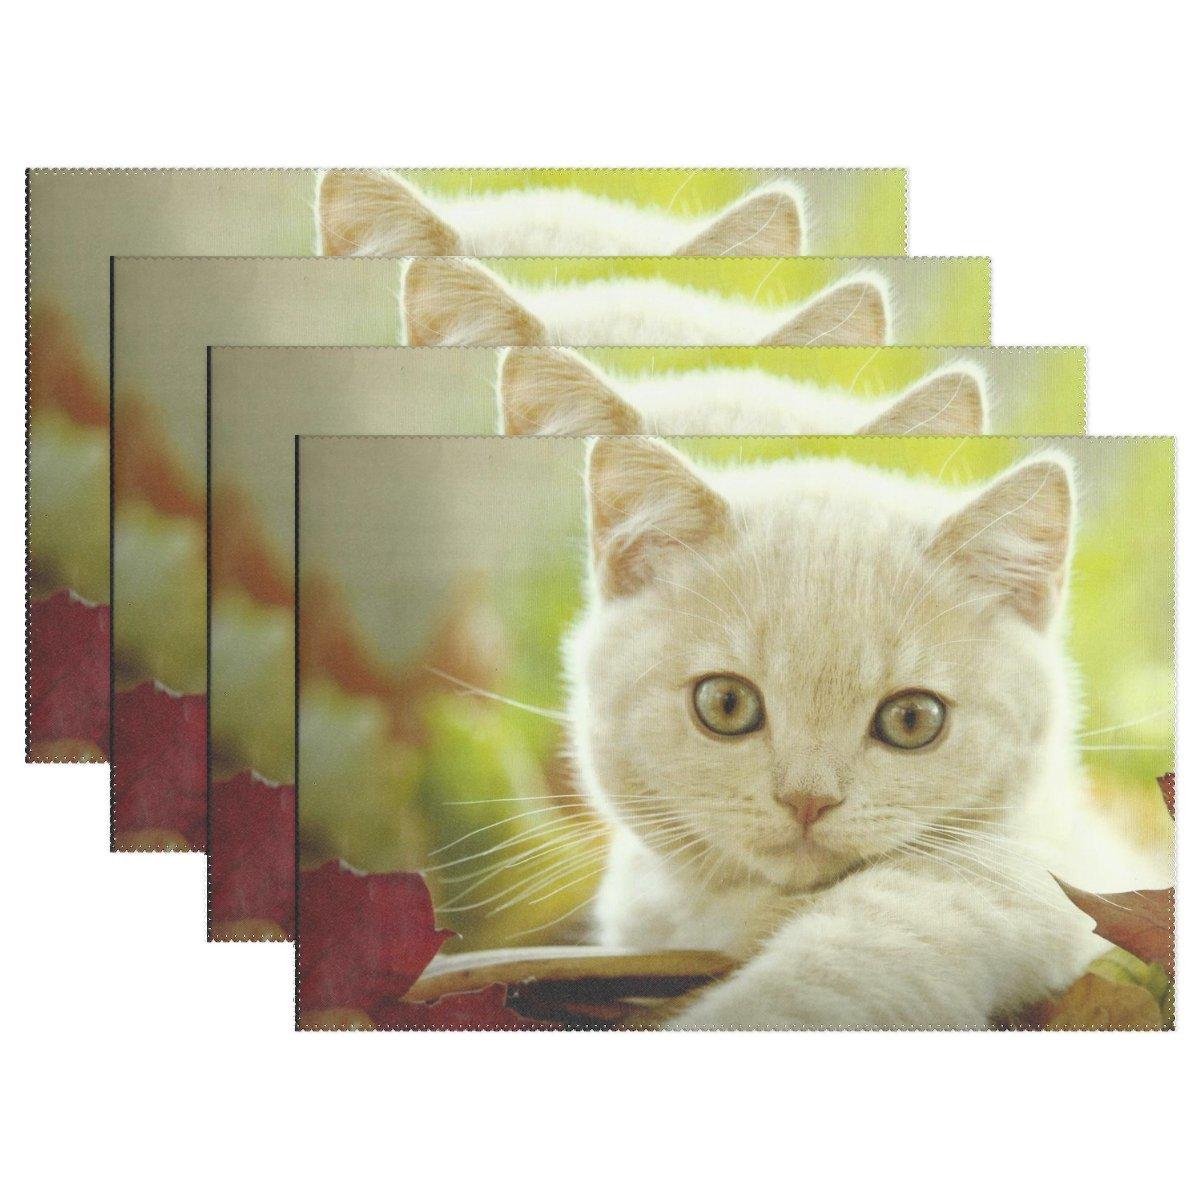 vnaskl動物猫Turkish Van Adorable Fluffy Smallペットキュートホワイト耐熱テーブルPlacemats Set of 4 Stain Resistantテーブルマット洗濯可能食べマットホームディナー装飾   B07D8MYQJW